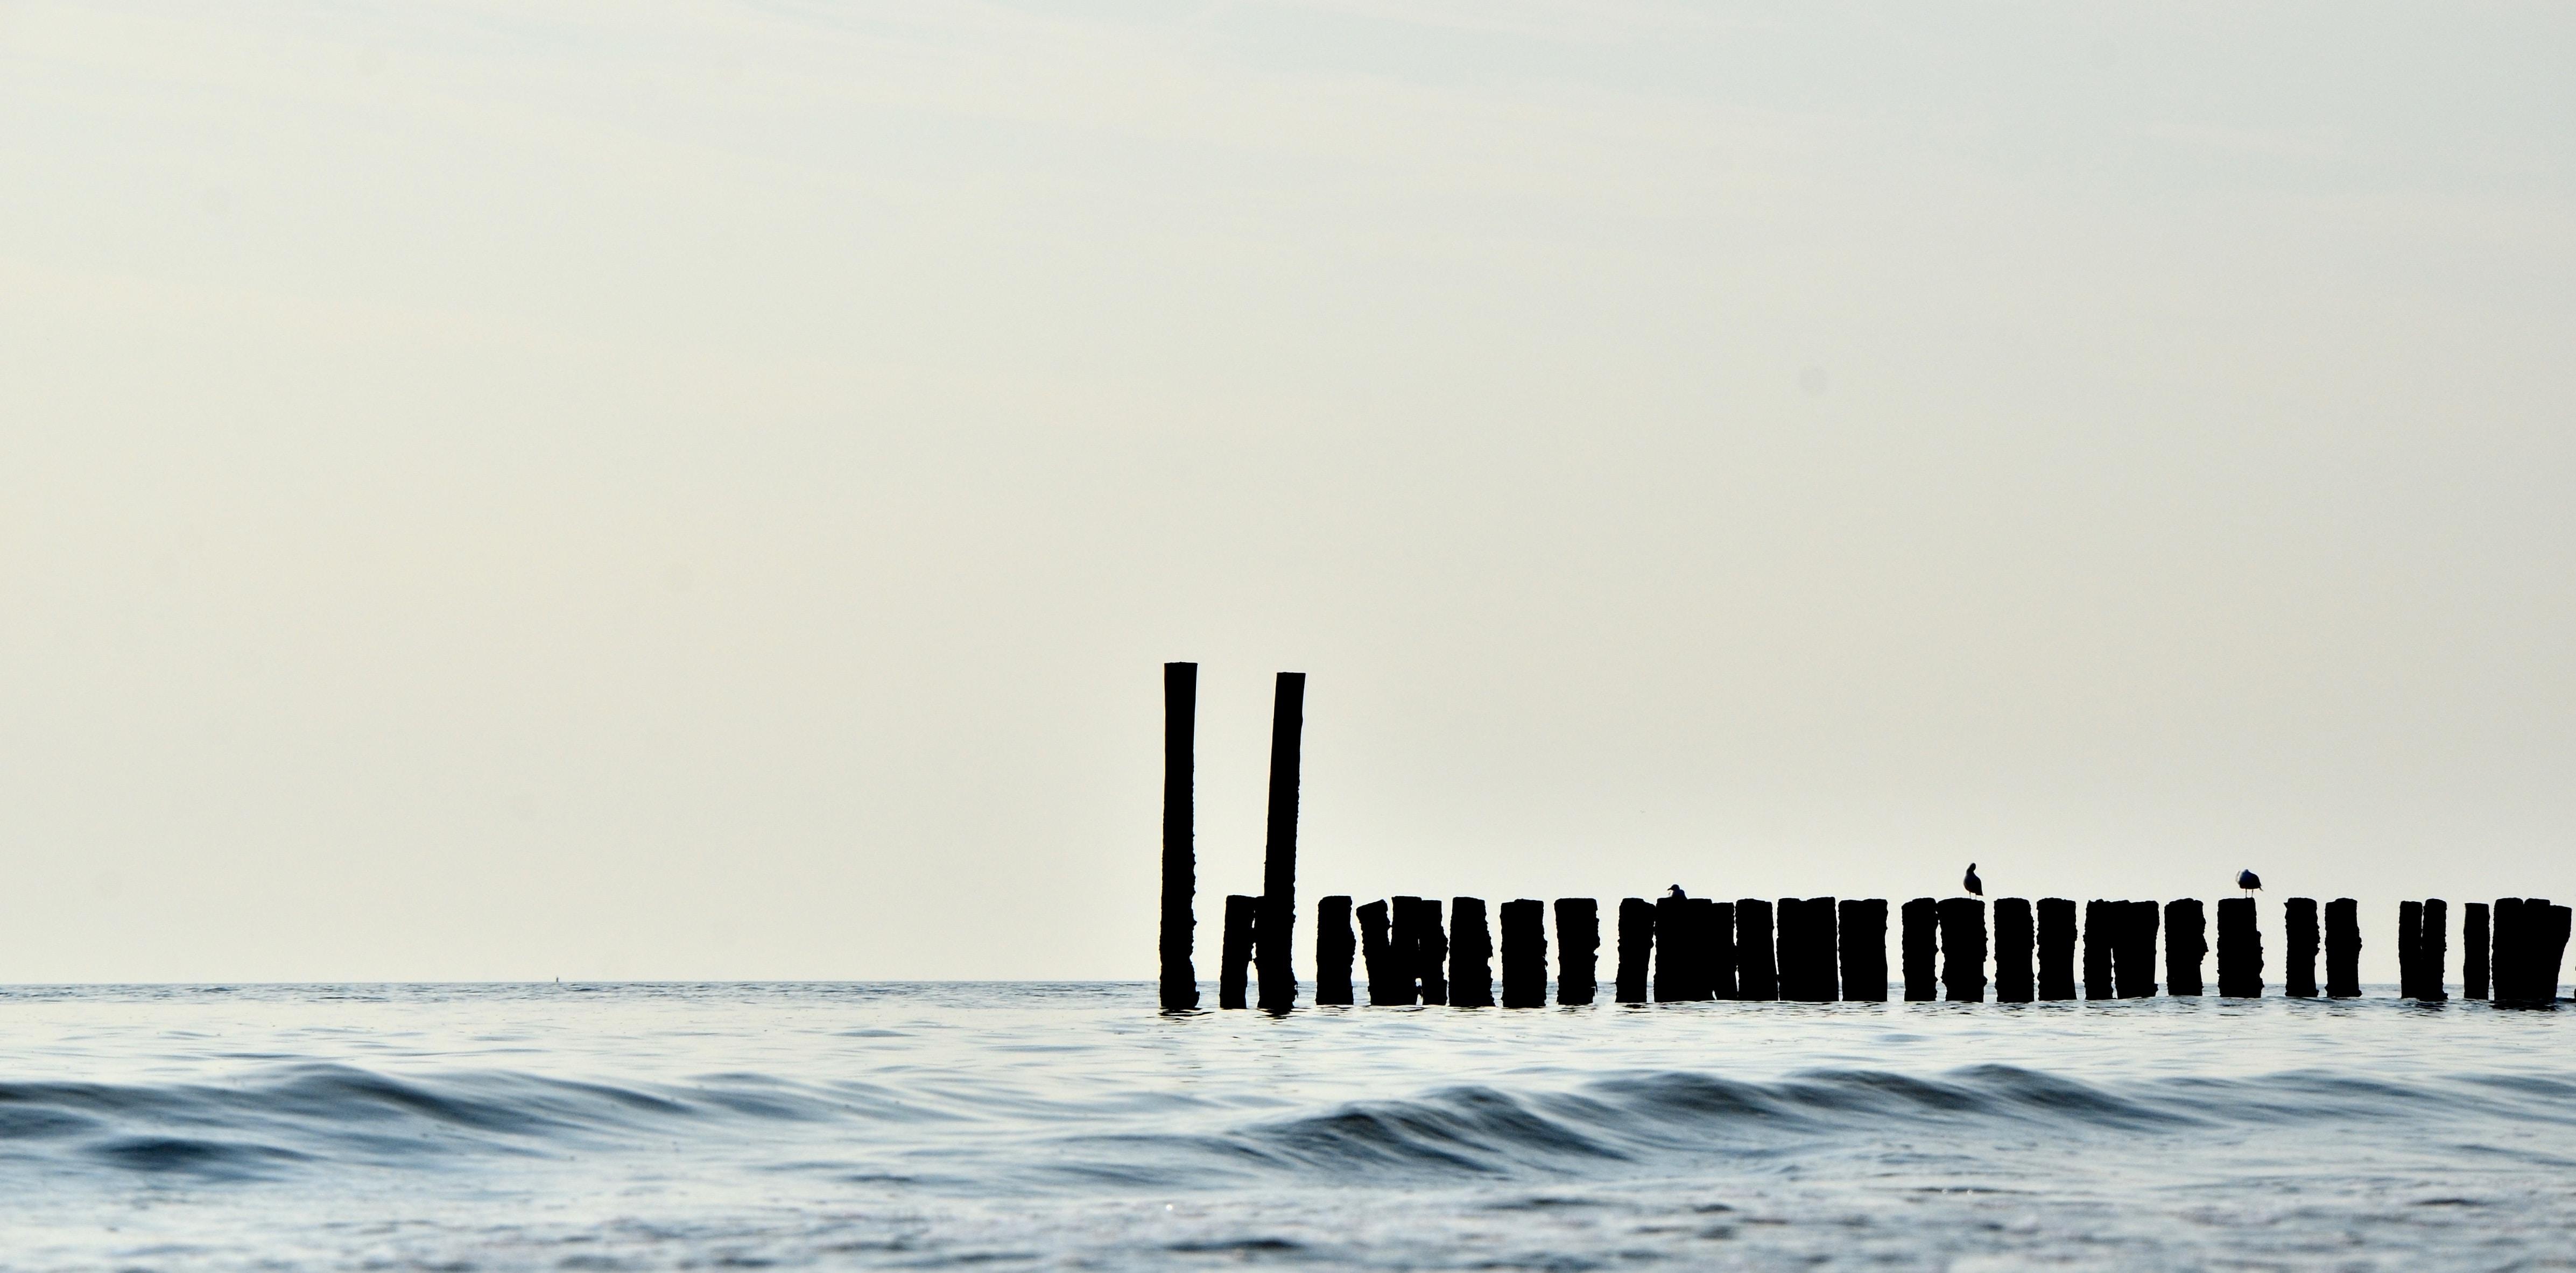 lumber in body of water